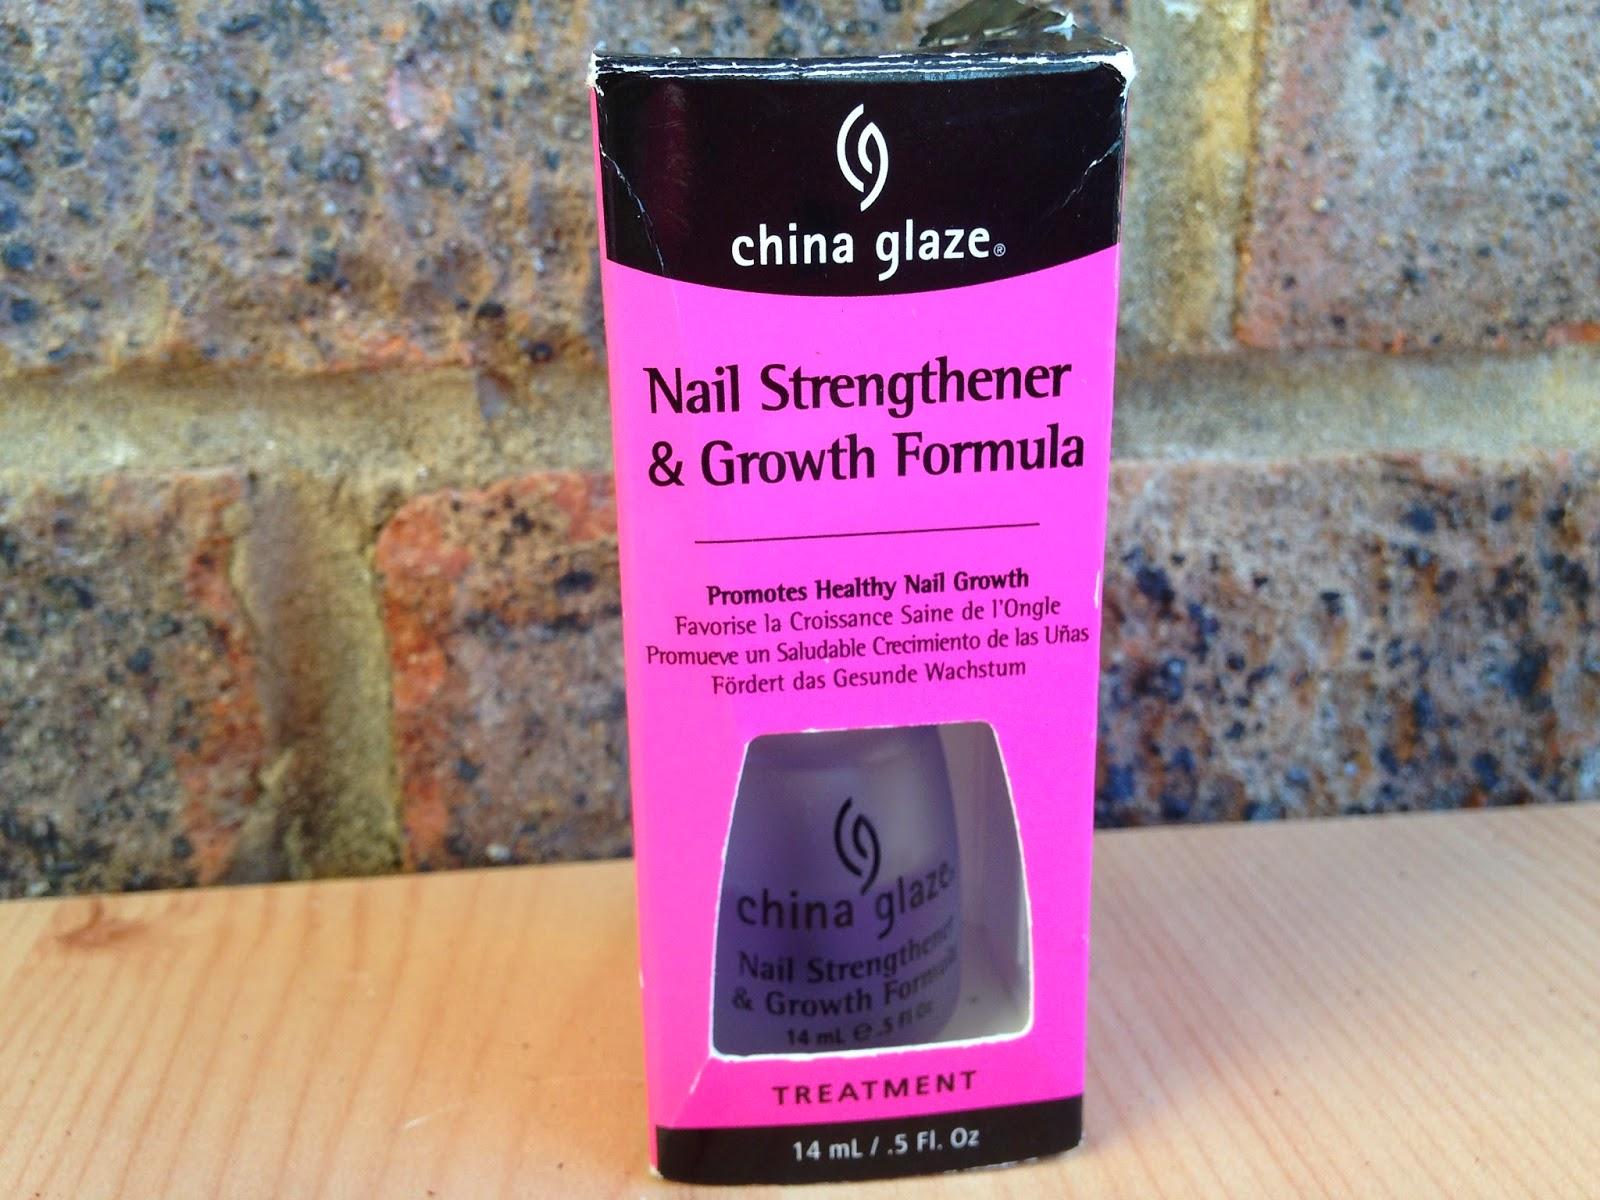 Ashleigh and Beth: China Glaze Nail Strengthener & Growth Formula